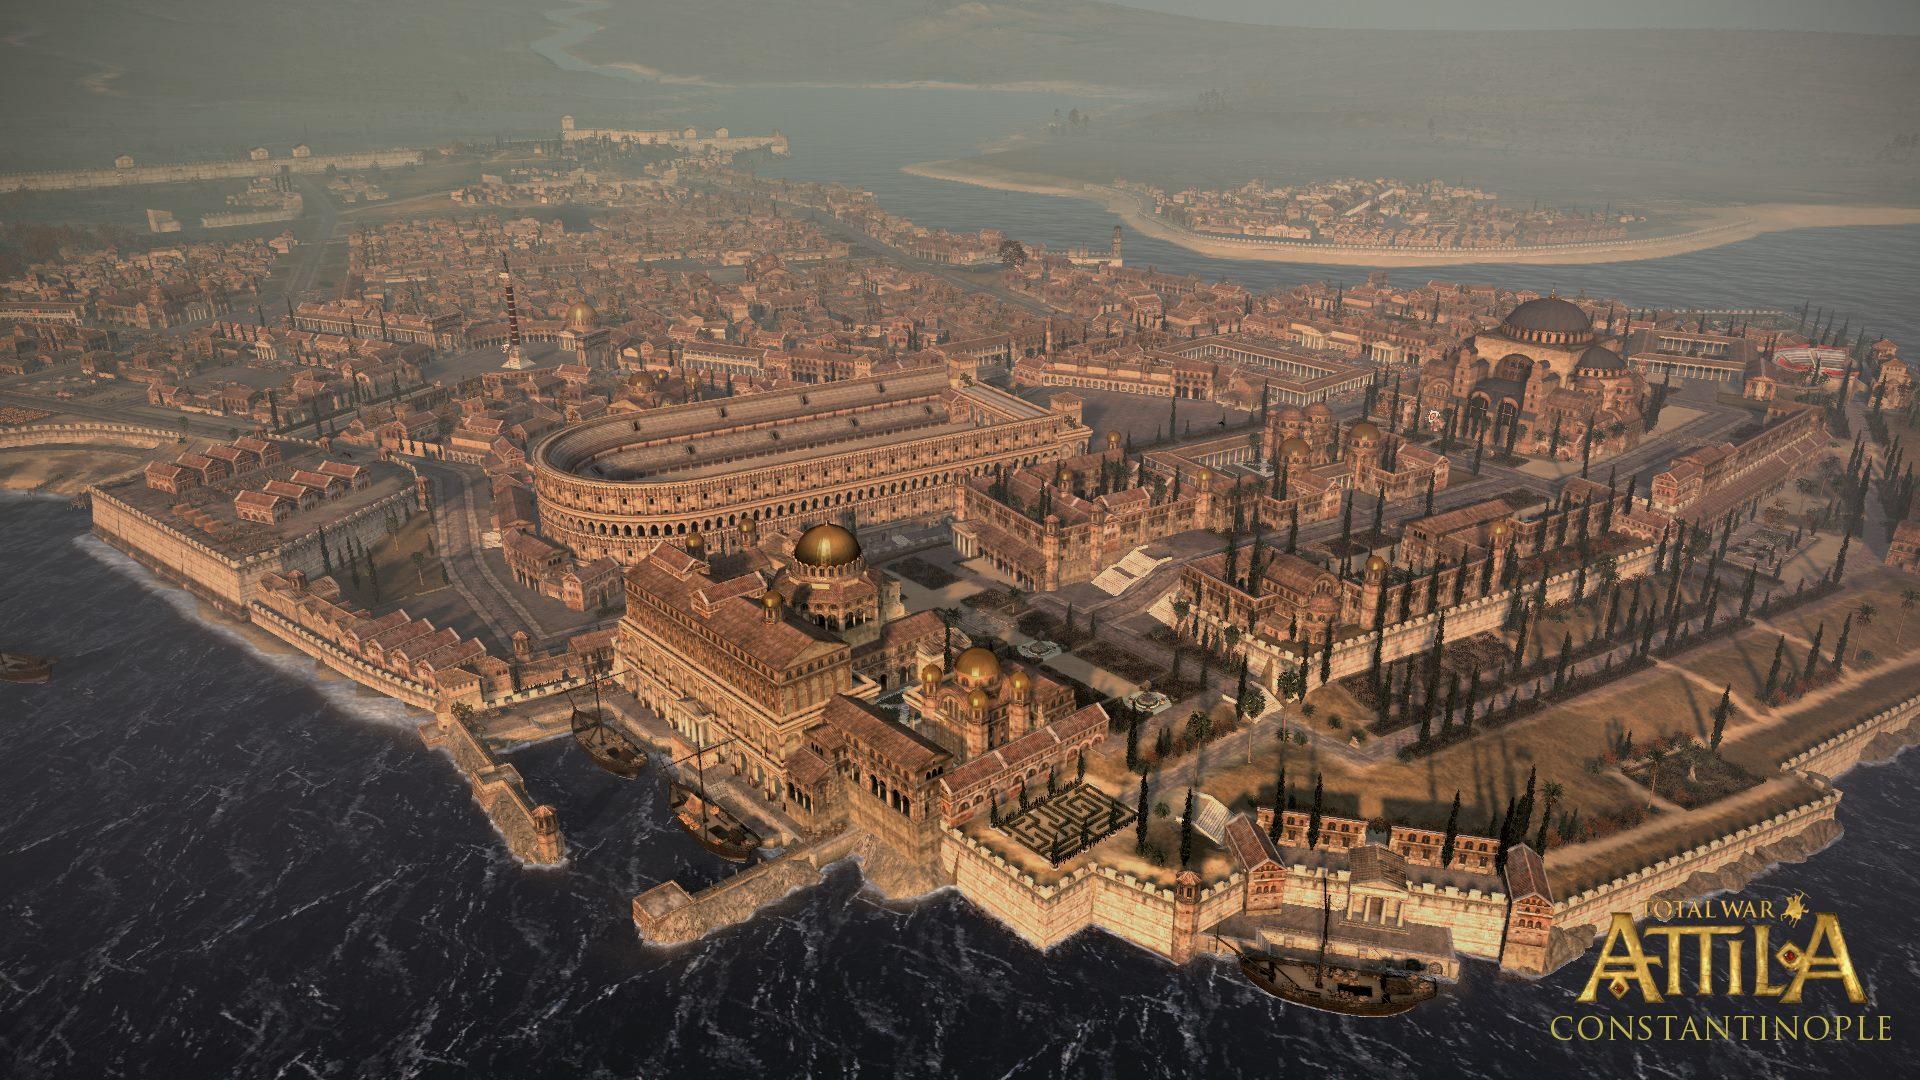 Constantinople | Total War Wiki | Fandom powered by Wikia